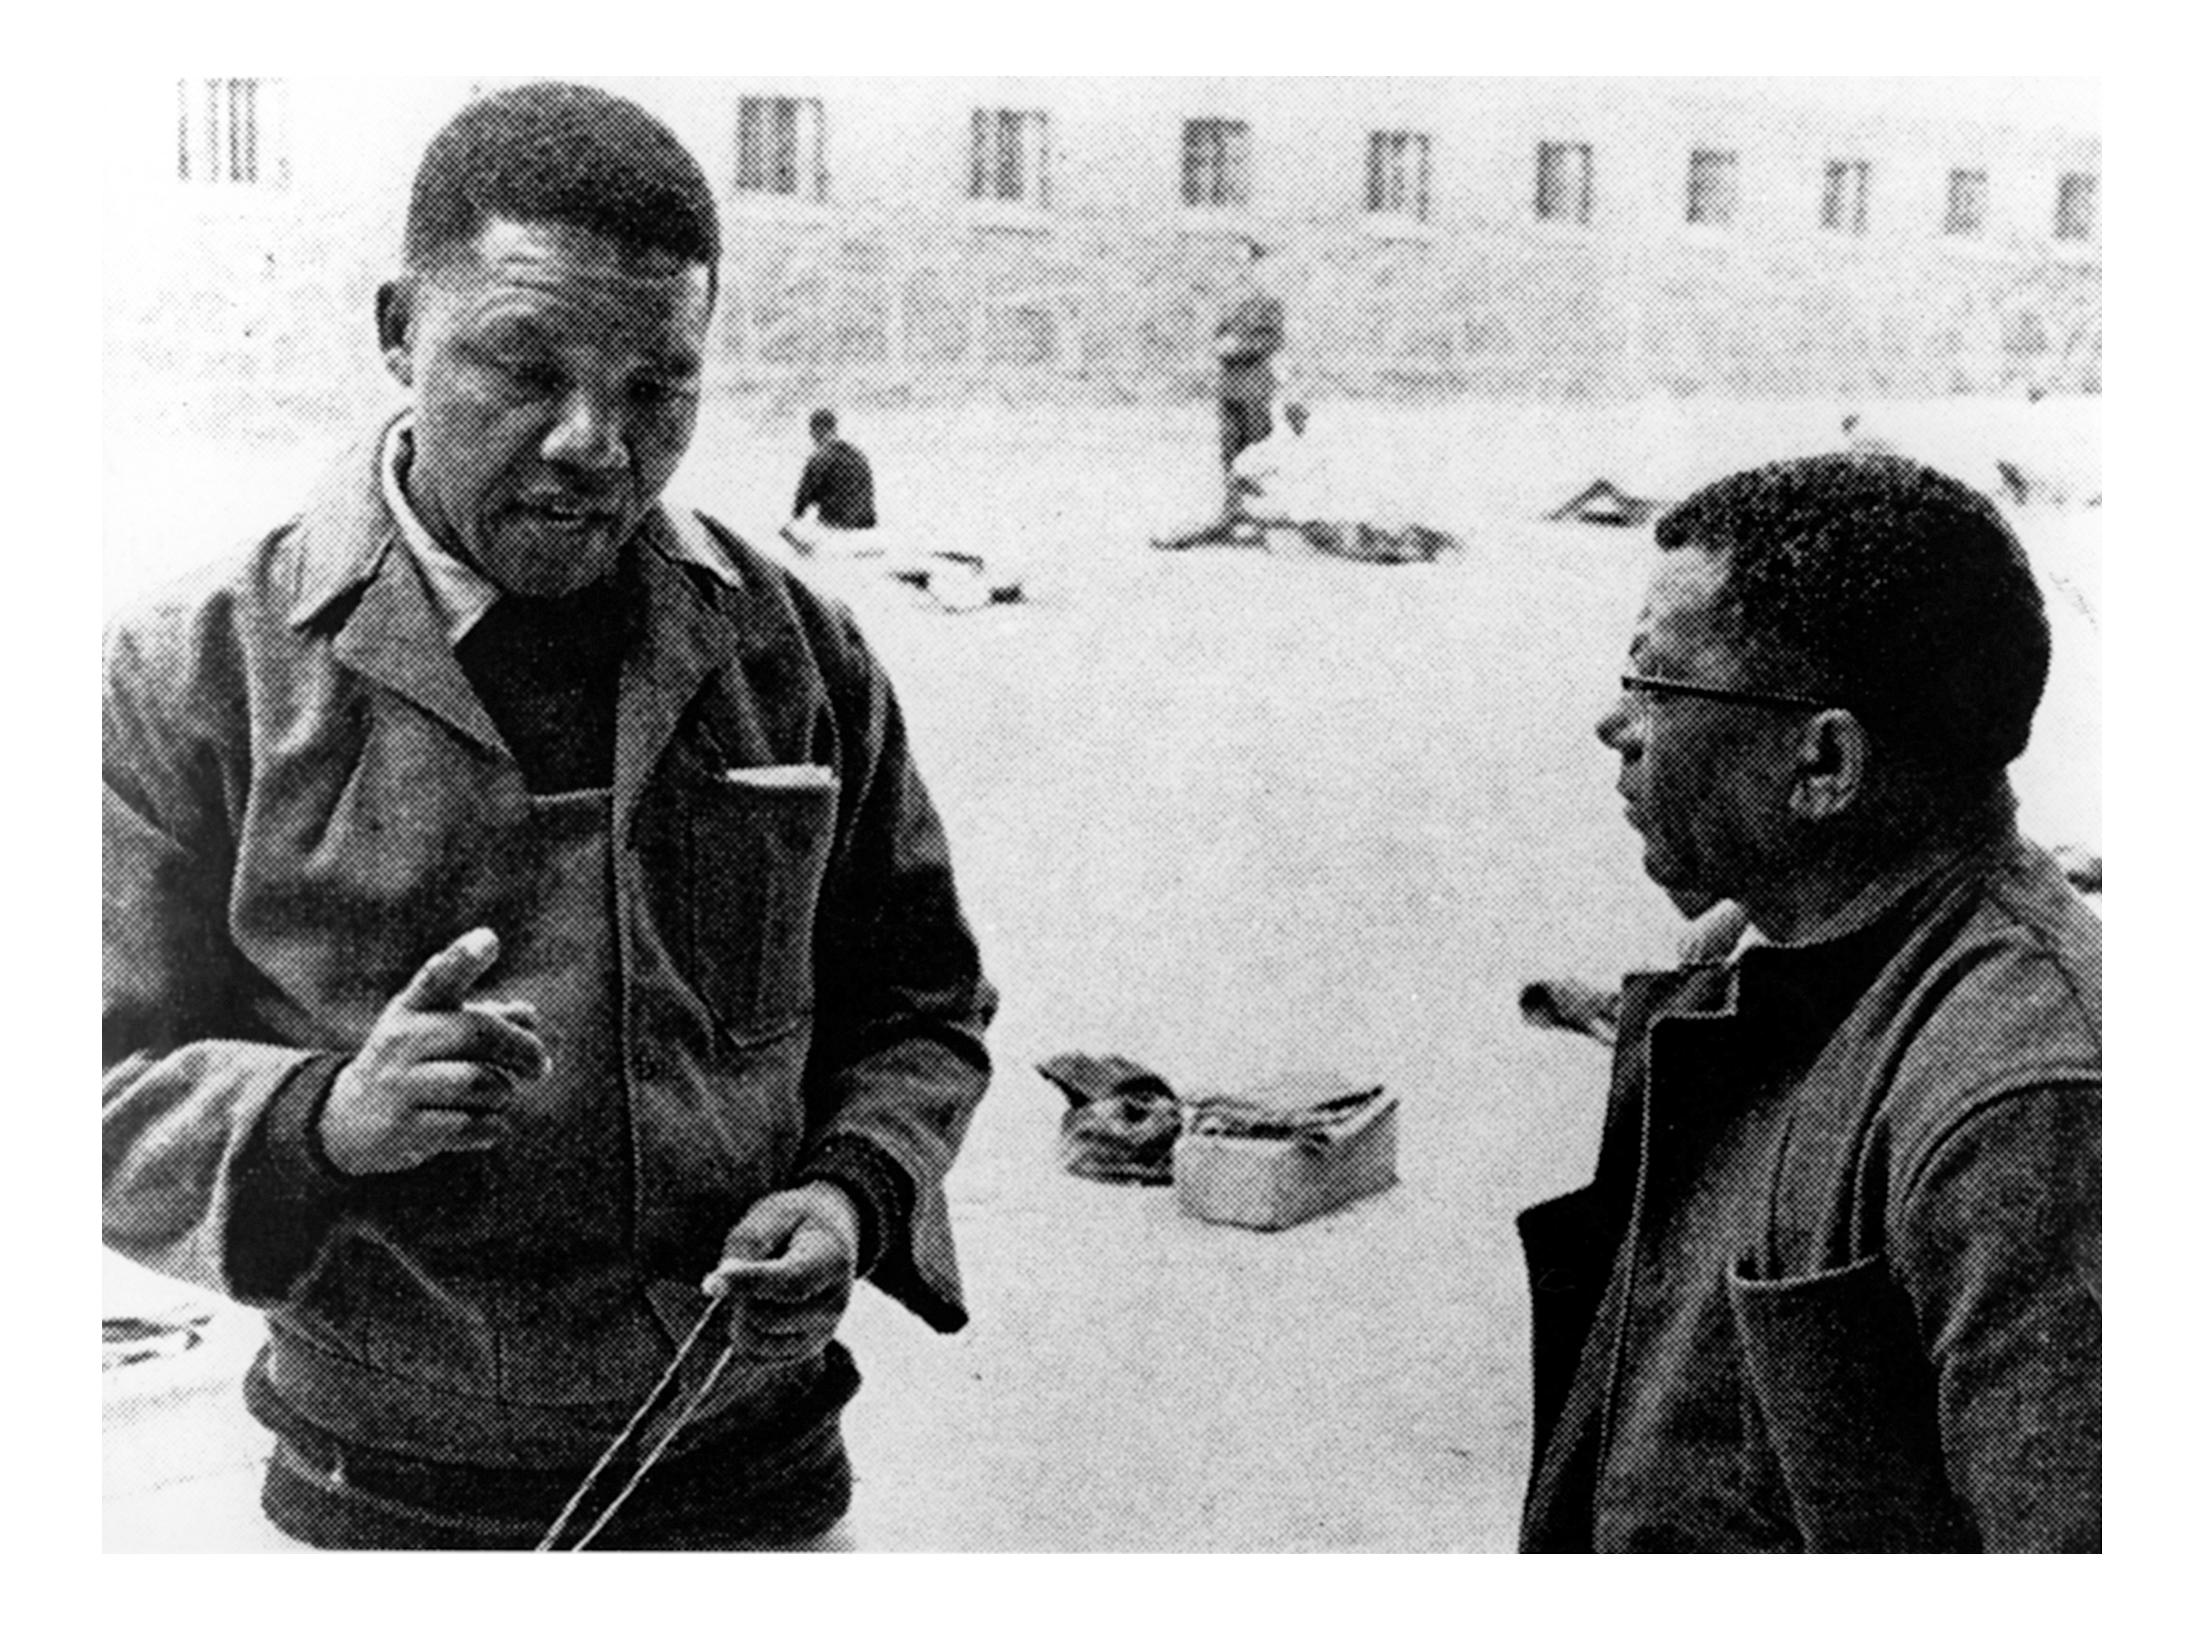 Mandela & Walter Sisulu at Robben Island